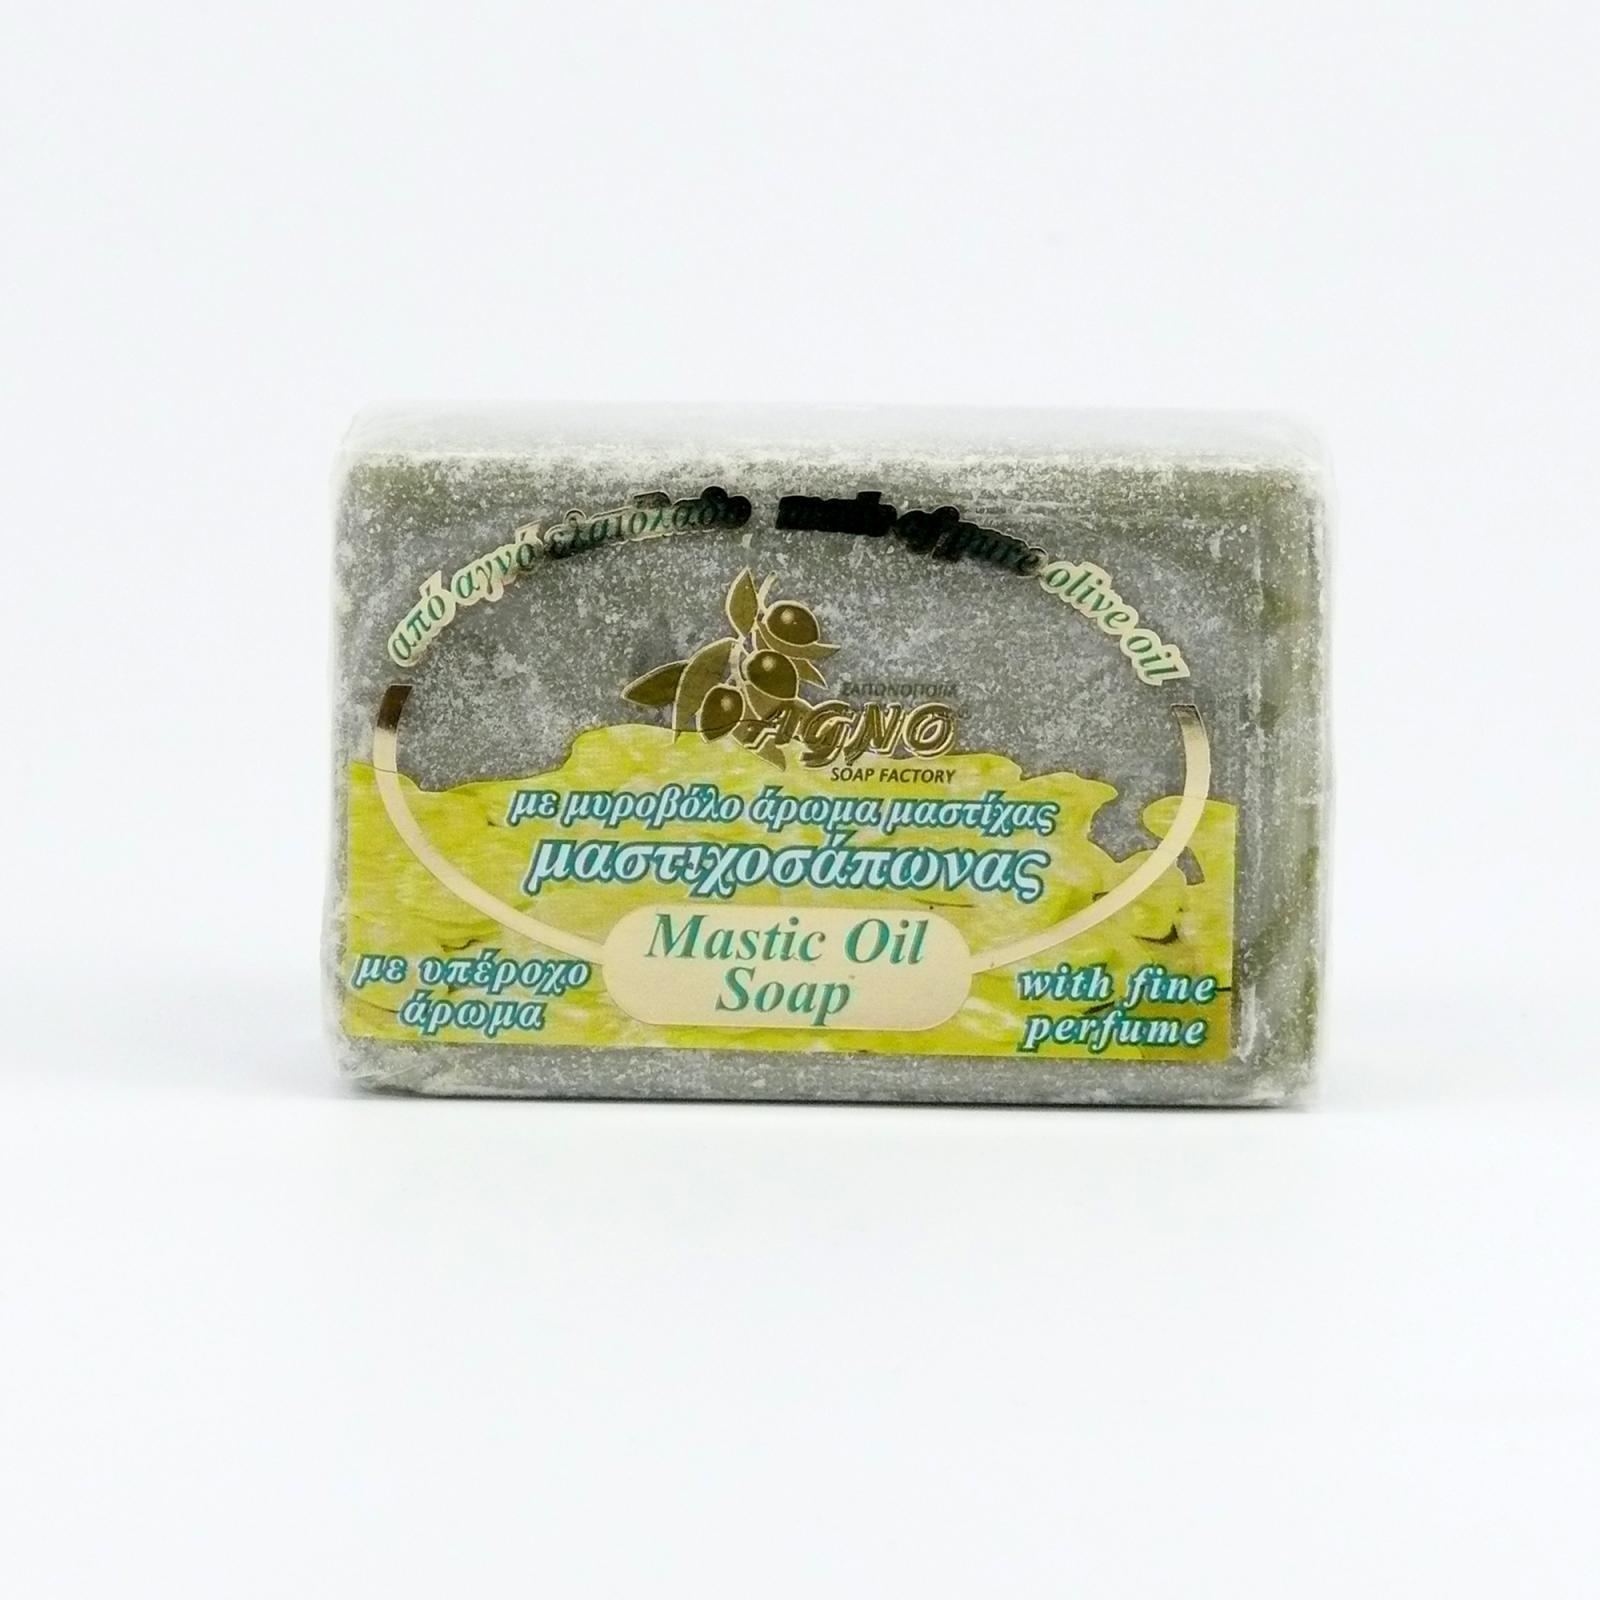 Agno Mýdlo olivové Mastic s mastichou 125 g